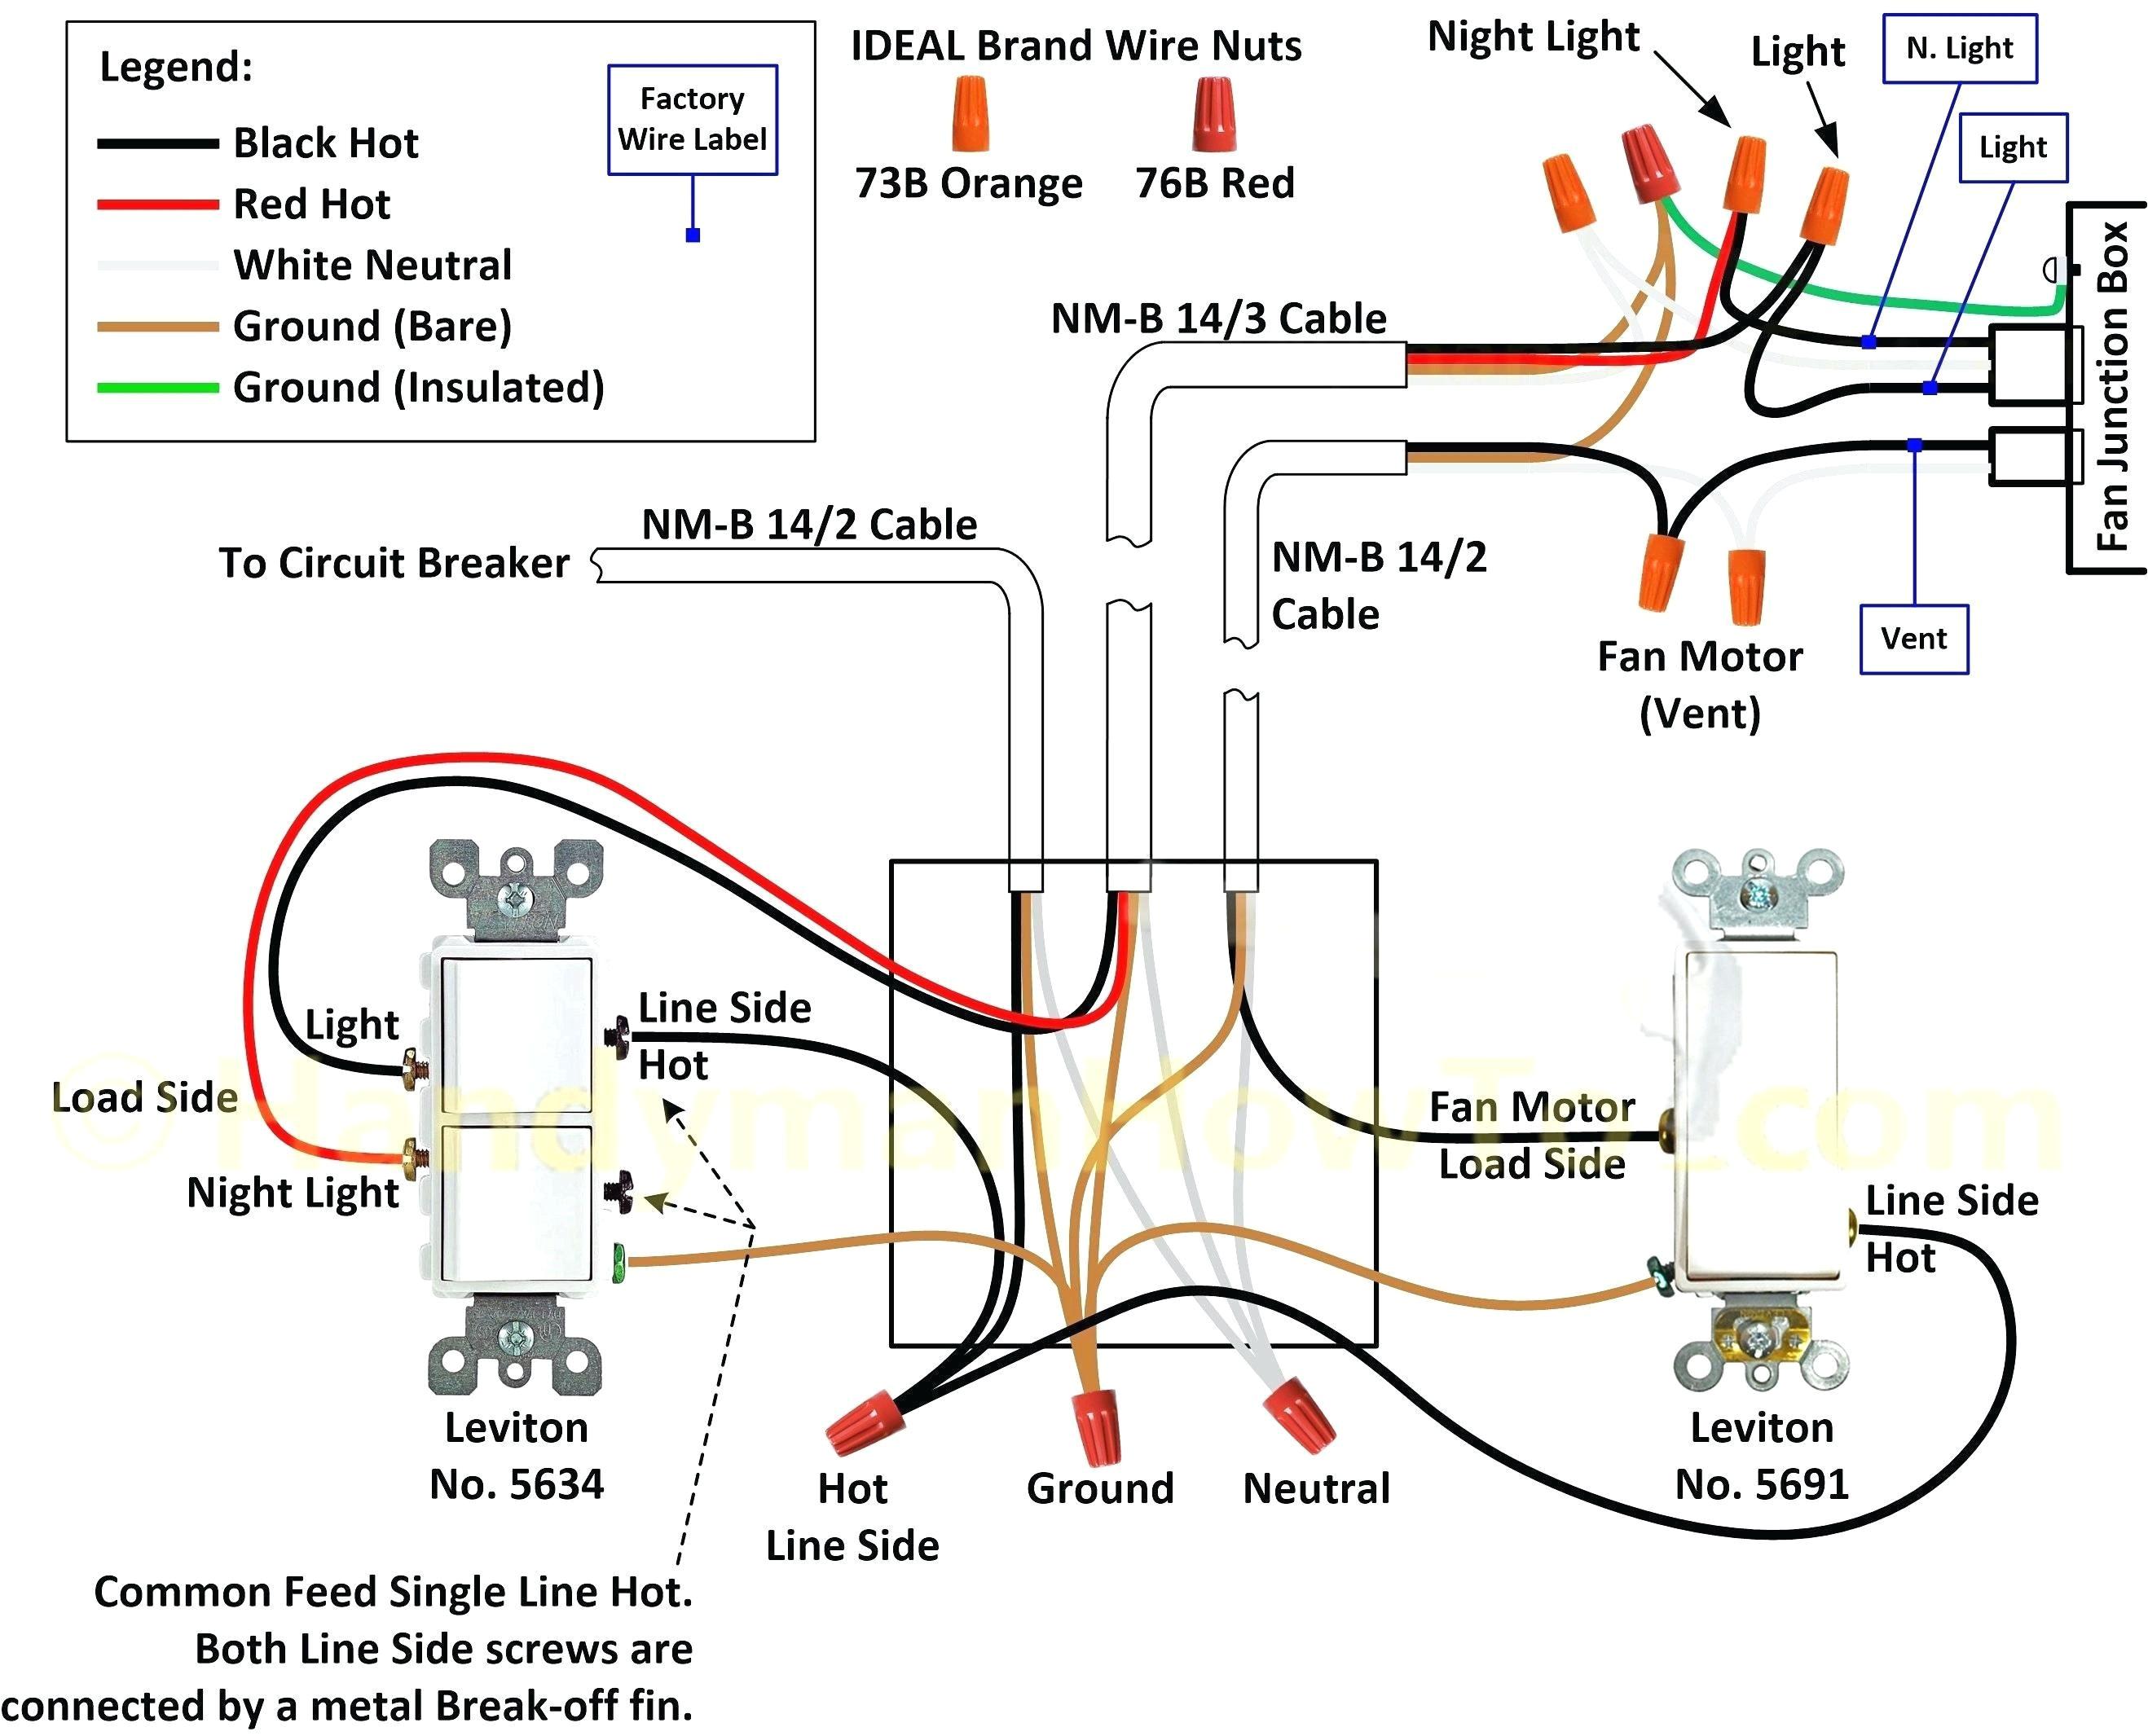 phone wire wiring diagram wiring diagram 4 line phone wiring diagram